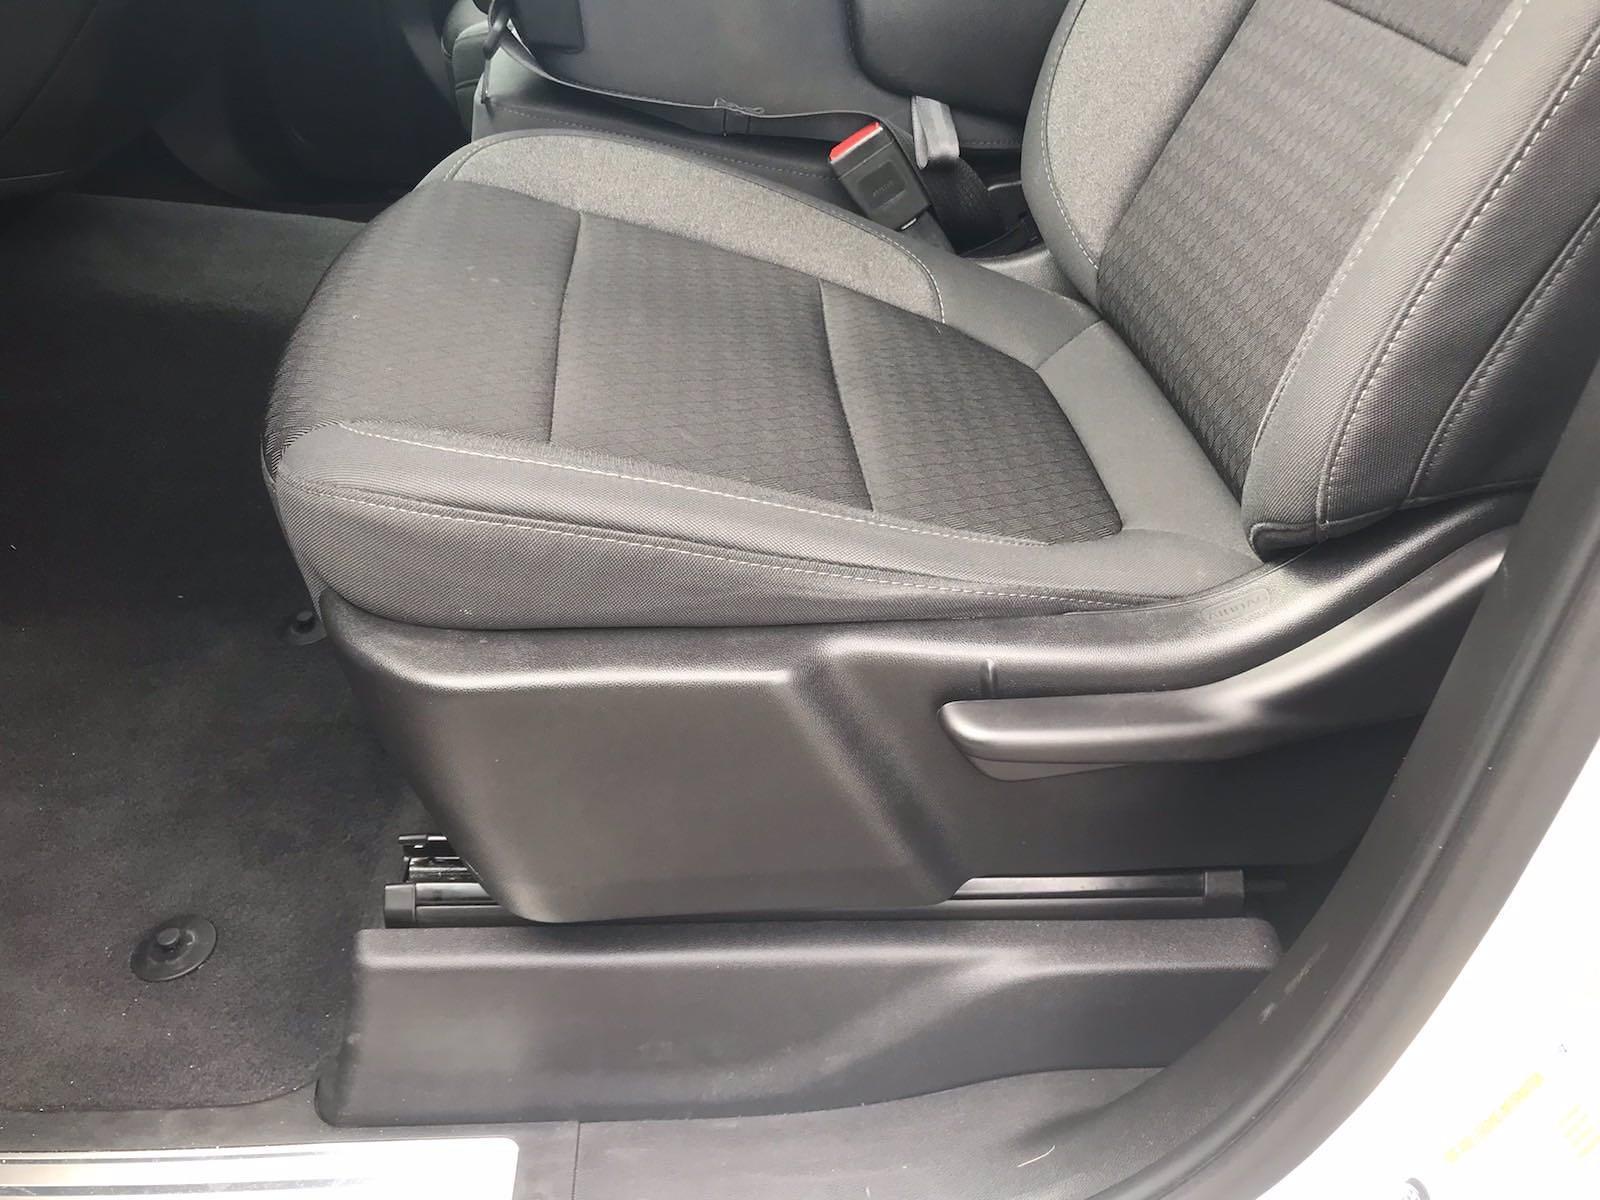 2020 Chevrolet Silverado 1500 Crew Cab 4x4, Pickup #16449PN - photo 23